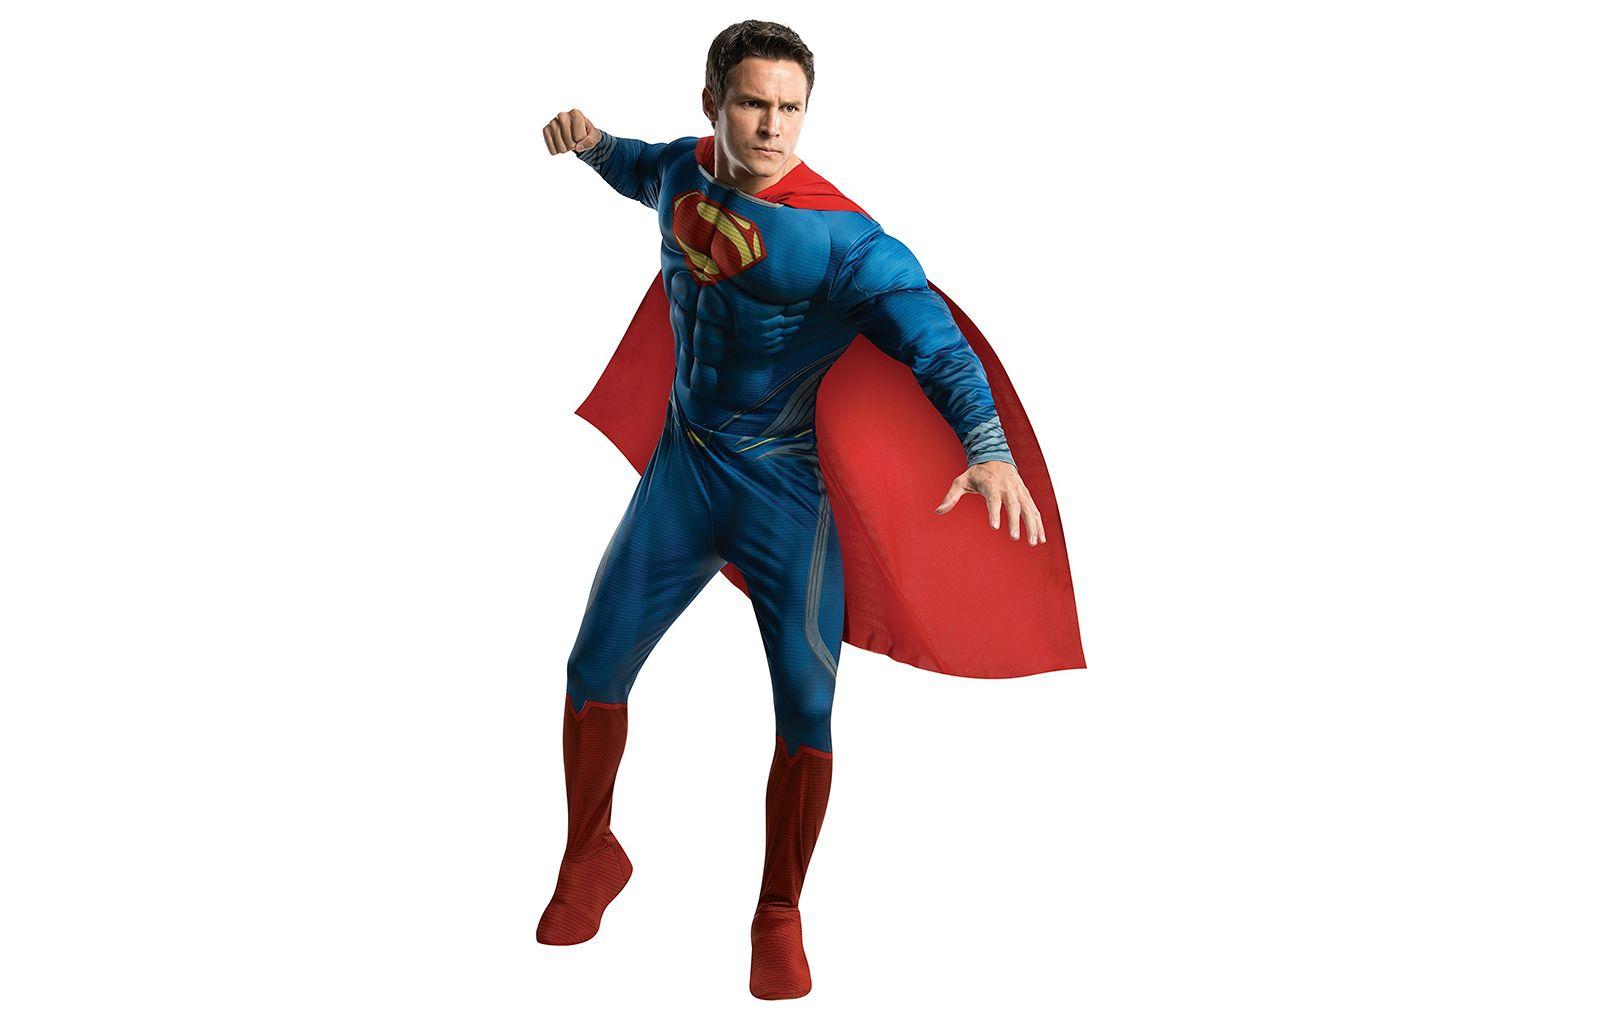 halloween costumes: 24 superhero costume ideas | men's health